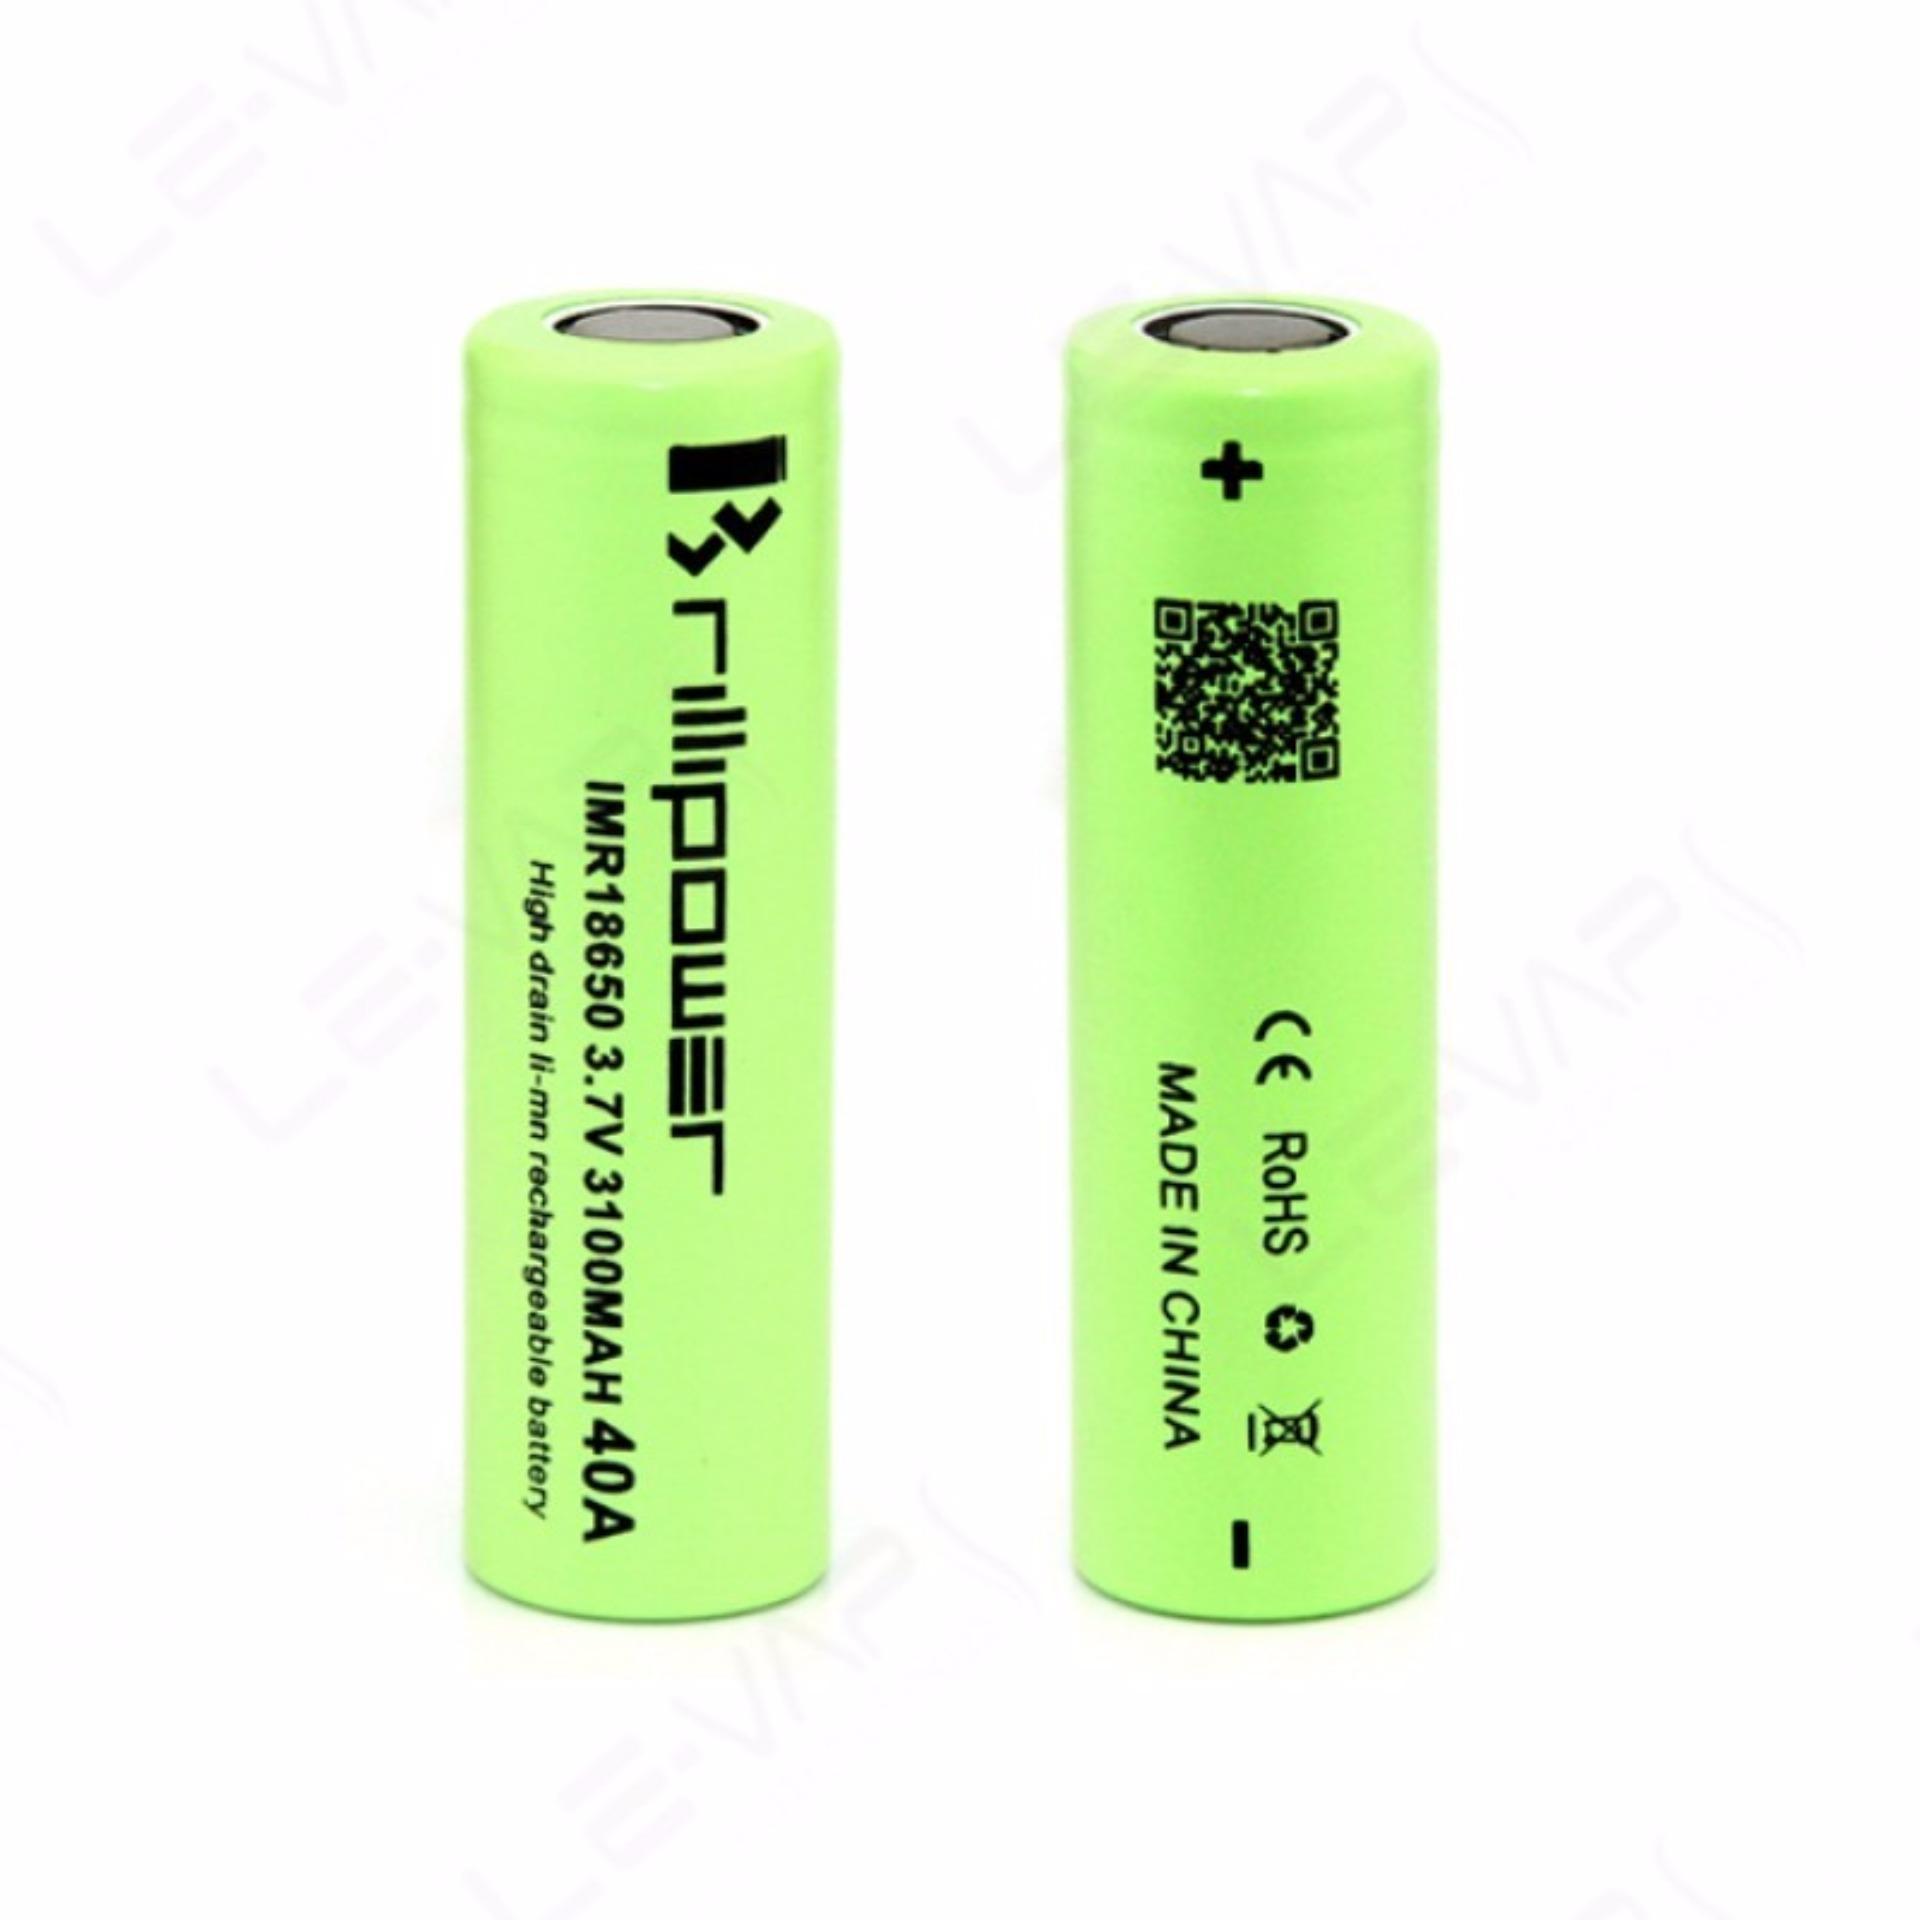 AWT Battery Black Widow IMR 18650 3500 Mah 3.7V 40A Baterai Rokok Elektrik Premium Quality